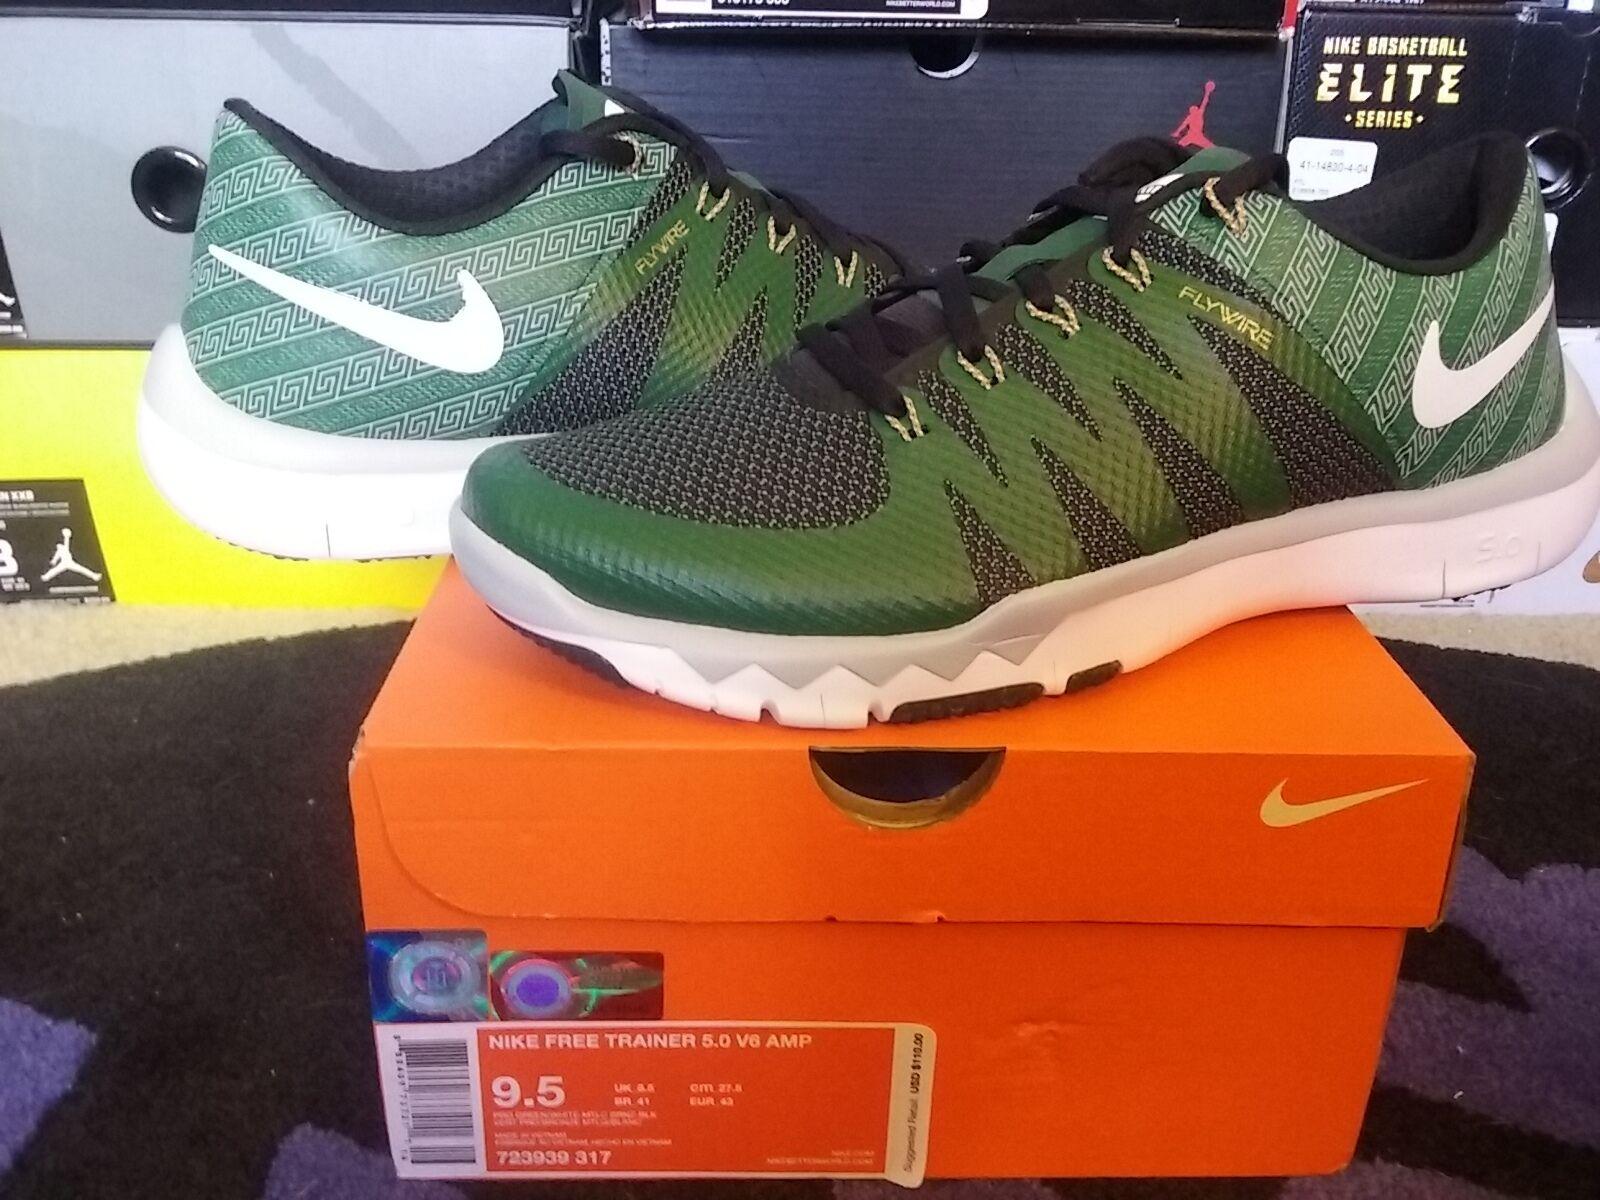 Nike Free Trainer 5 V6 AMP Michigan State Spartans semana Wild cero 1 723939 317 Wild semana Casual Shoes 9d10f2